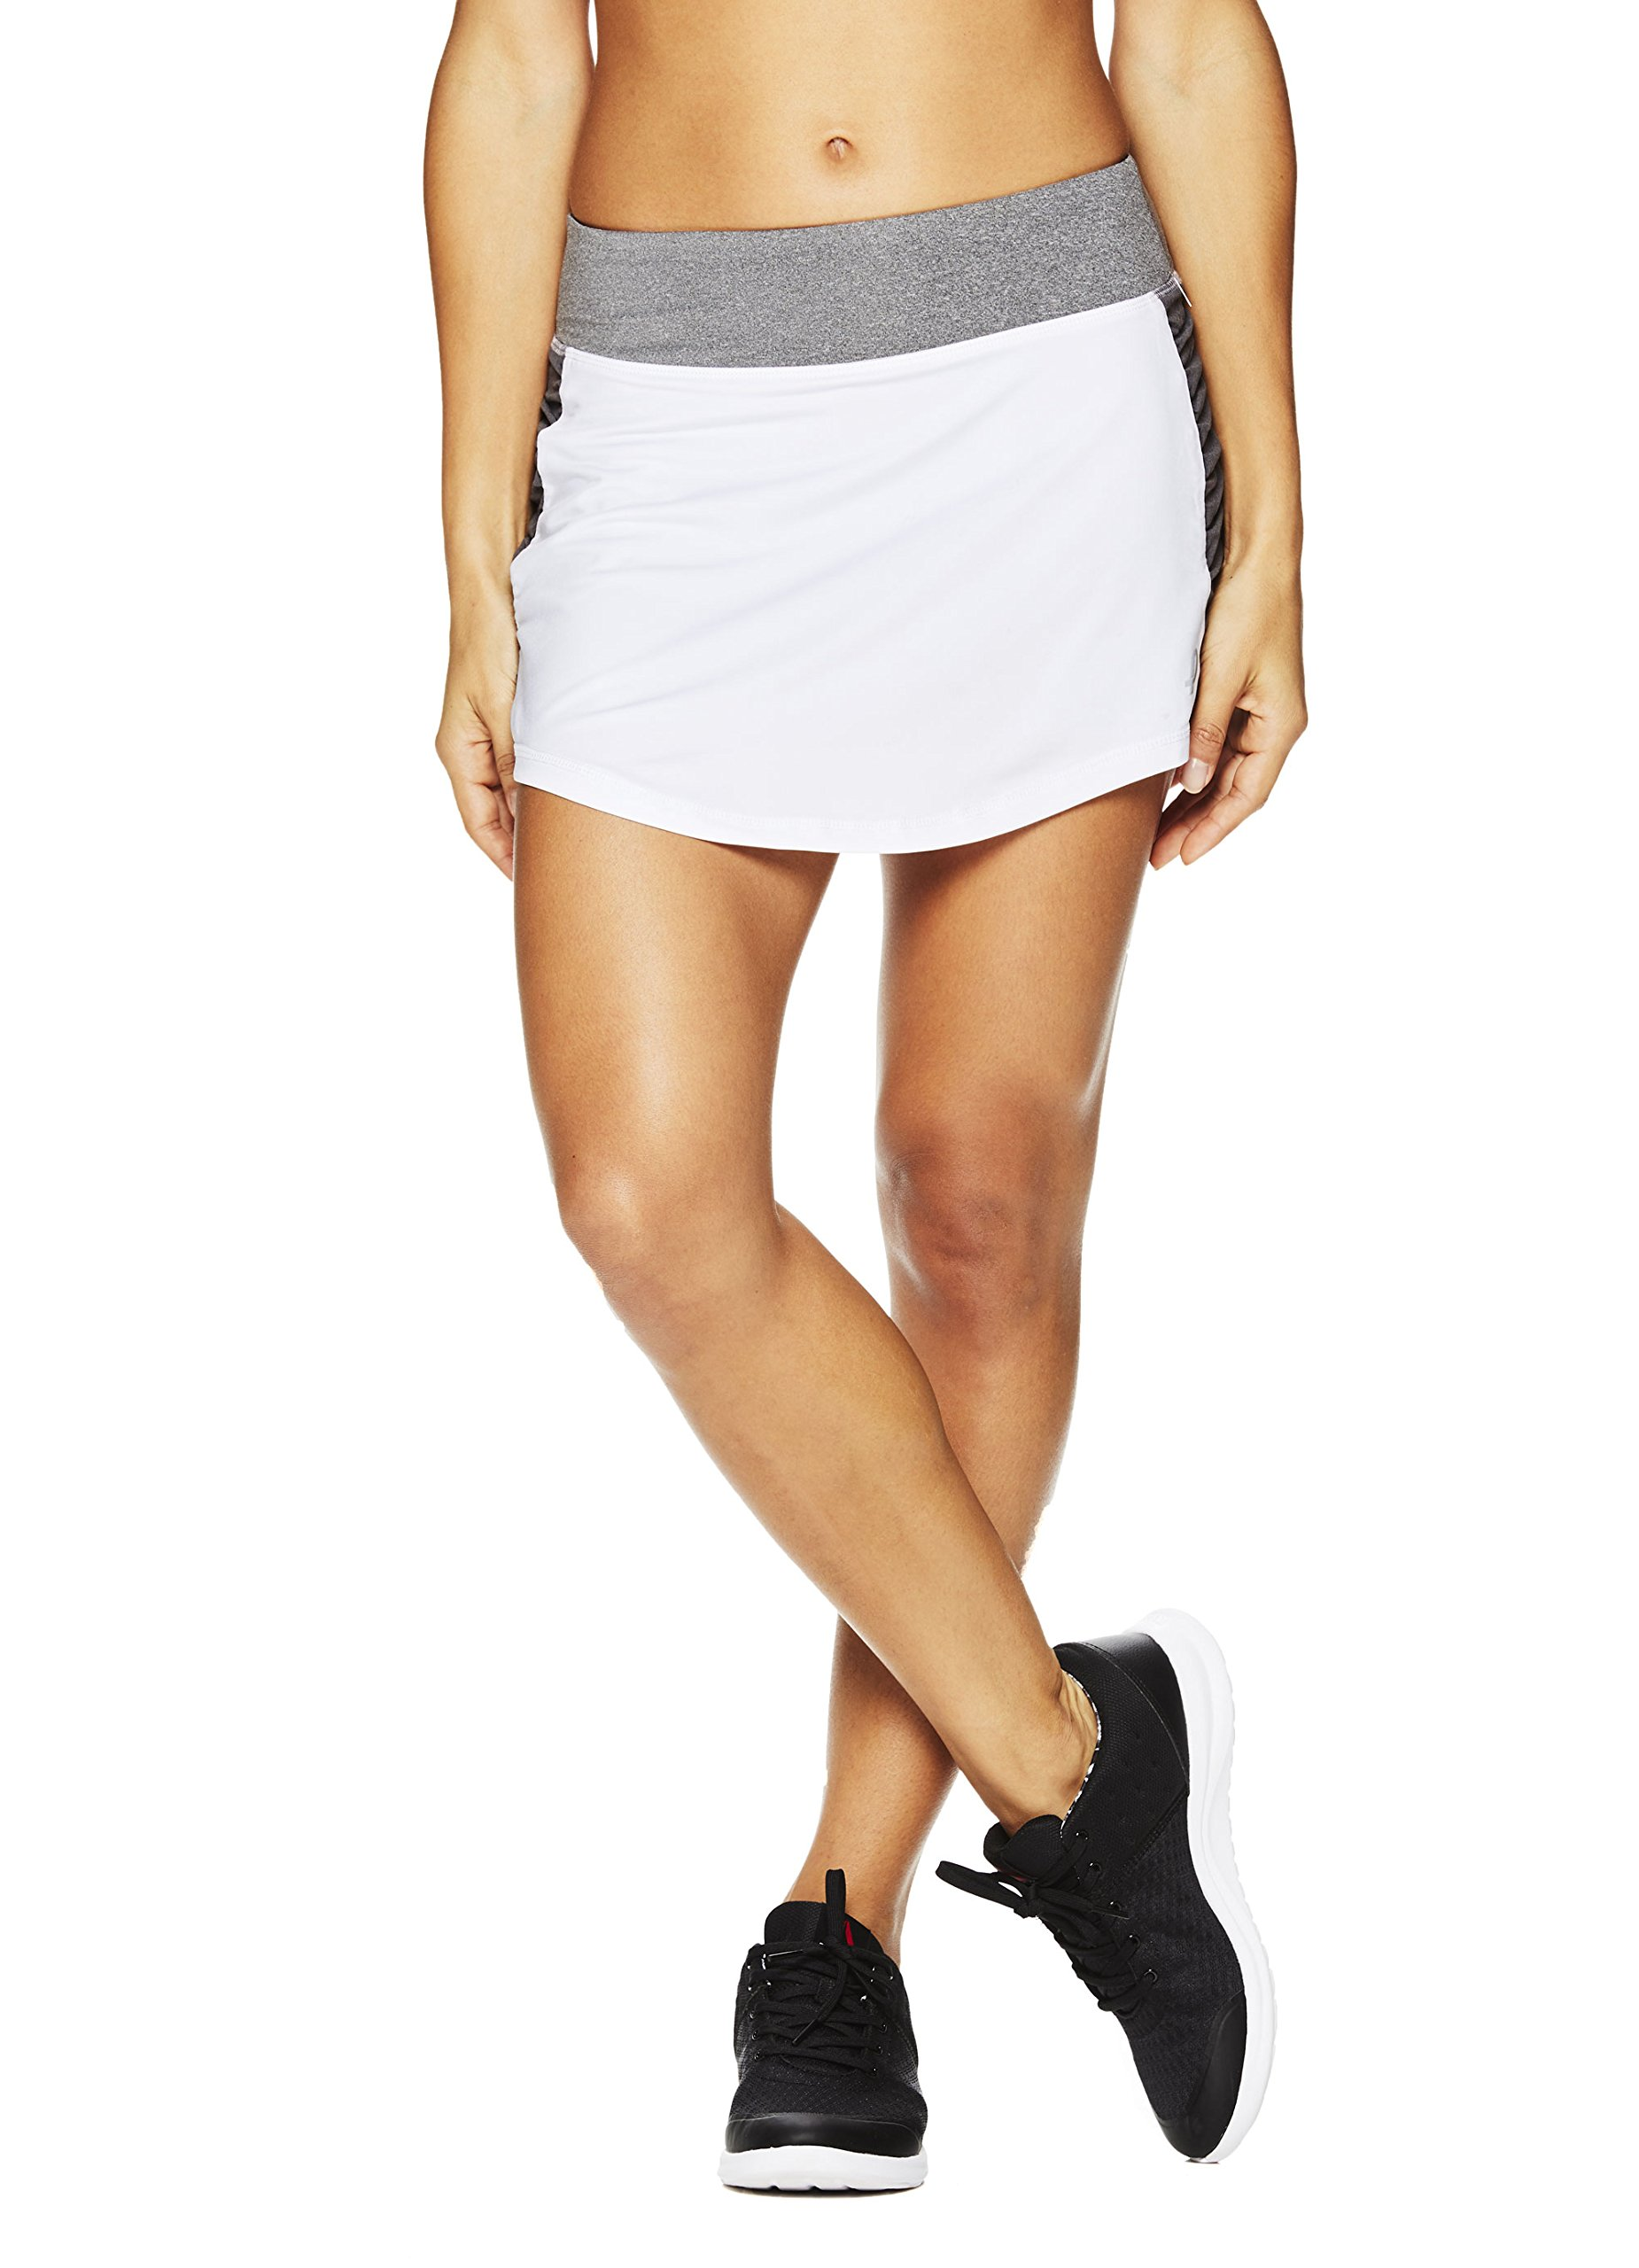 Penn Women's Solid Rocket Mesh Athletic Performance Tennis & Golf Skort - Rocket Stark White, X-Small